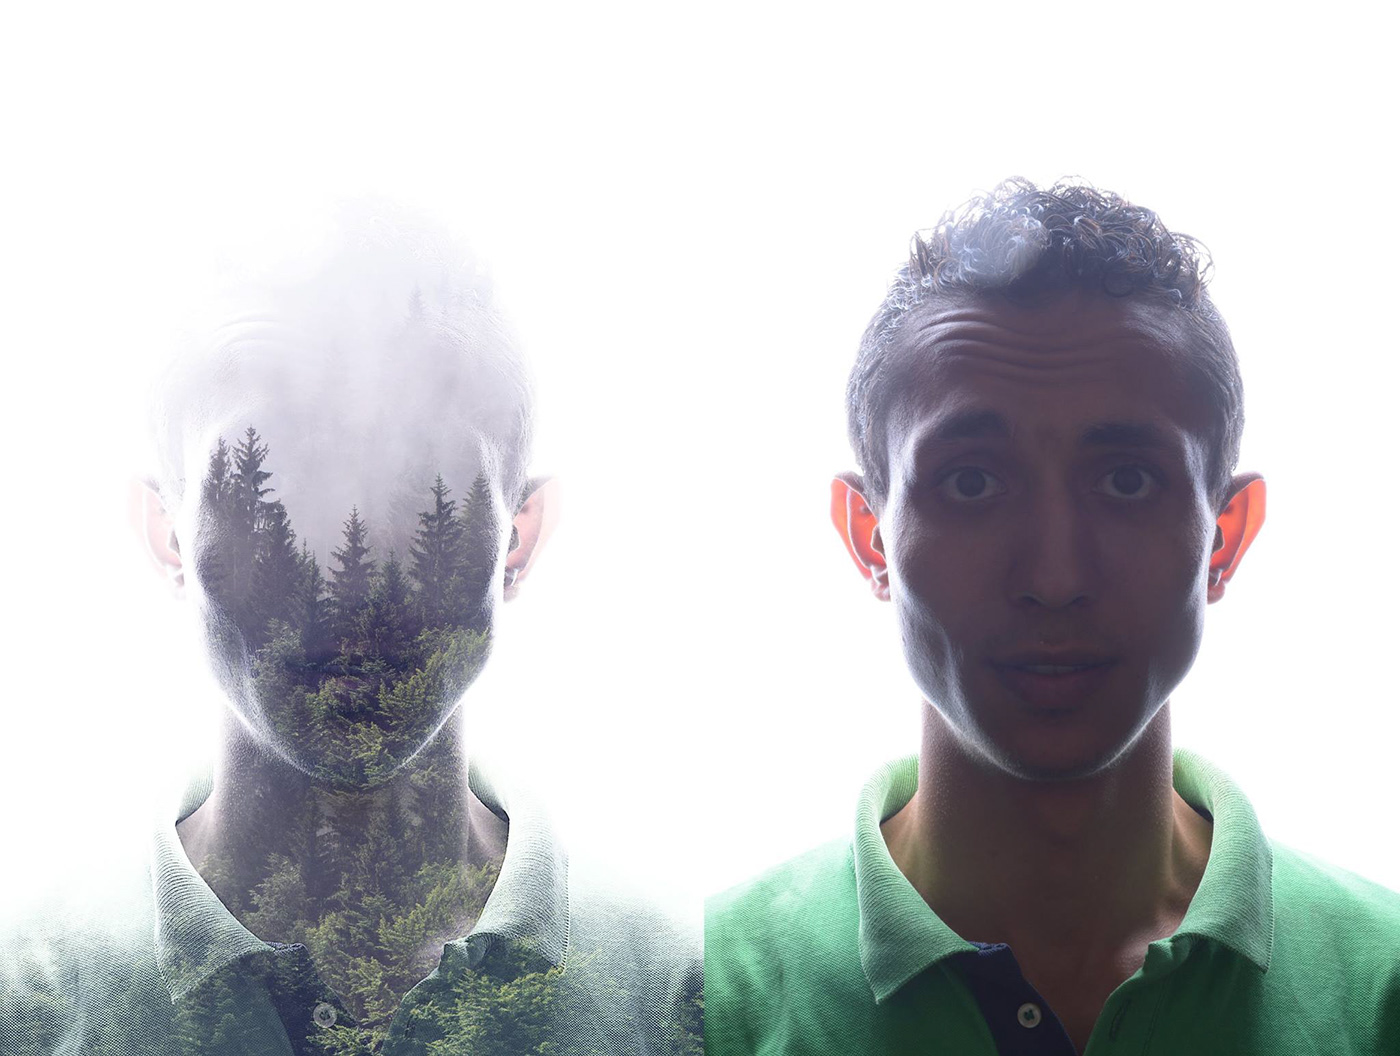 double exposure iManipulate art design effect photoshop PS light room